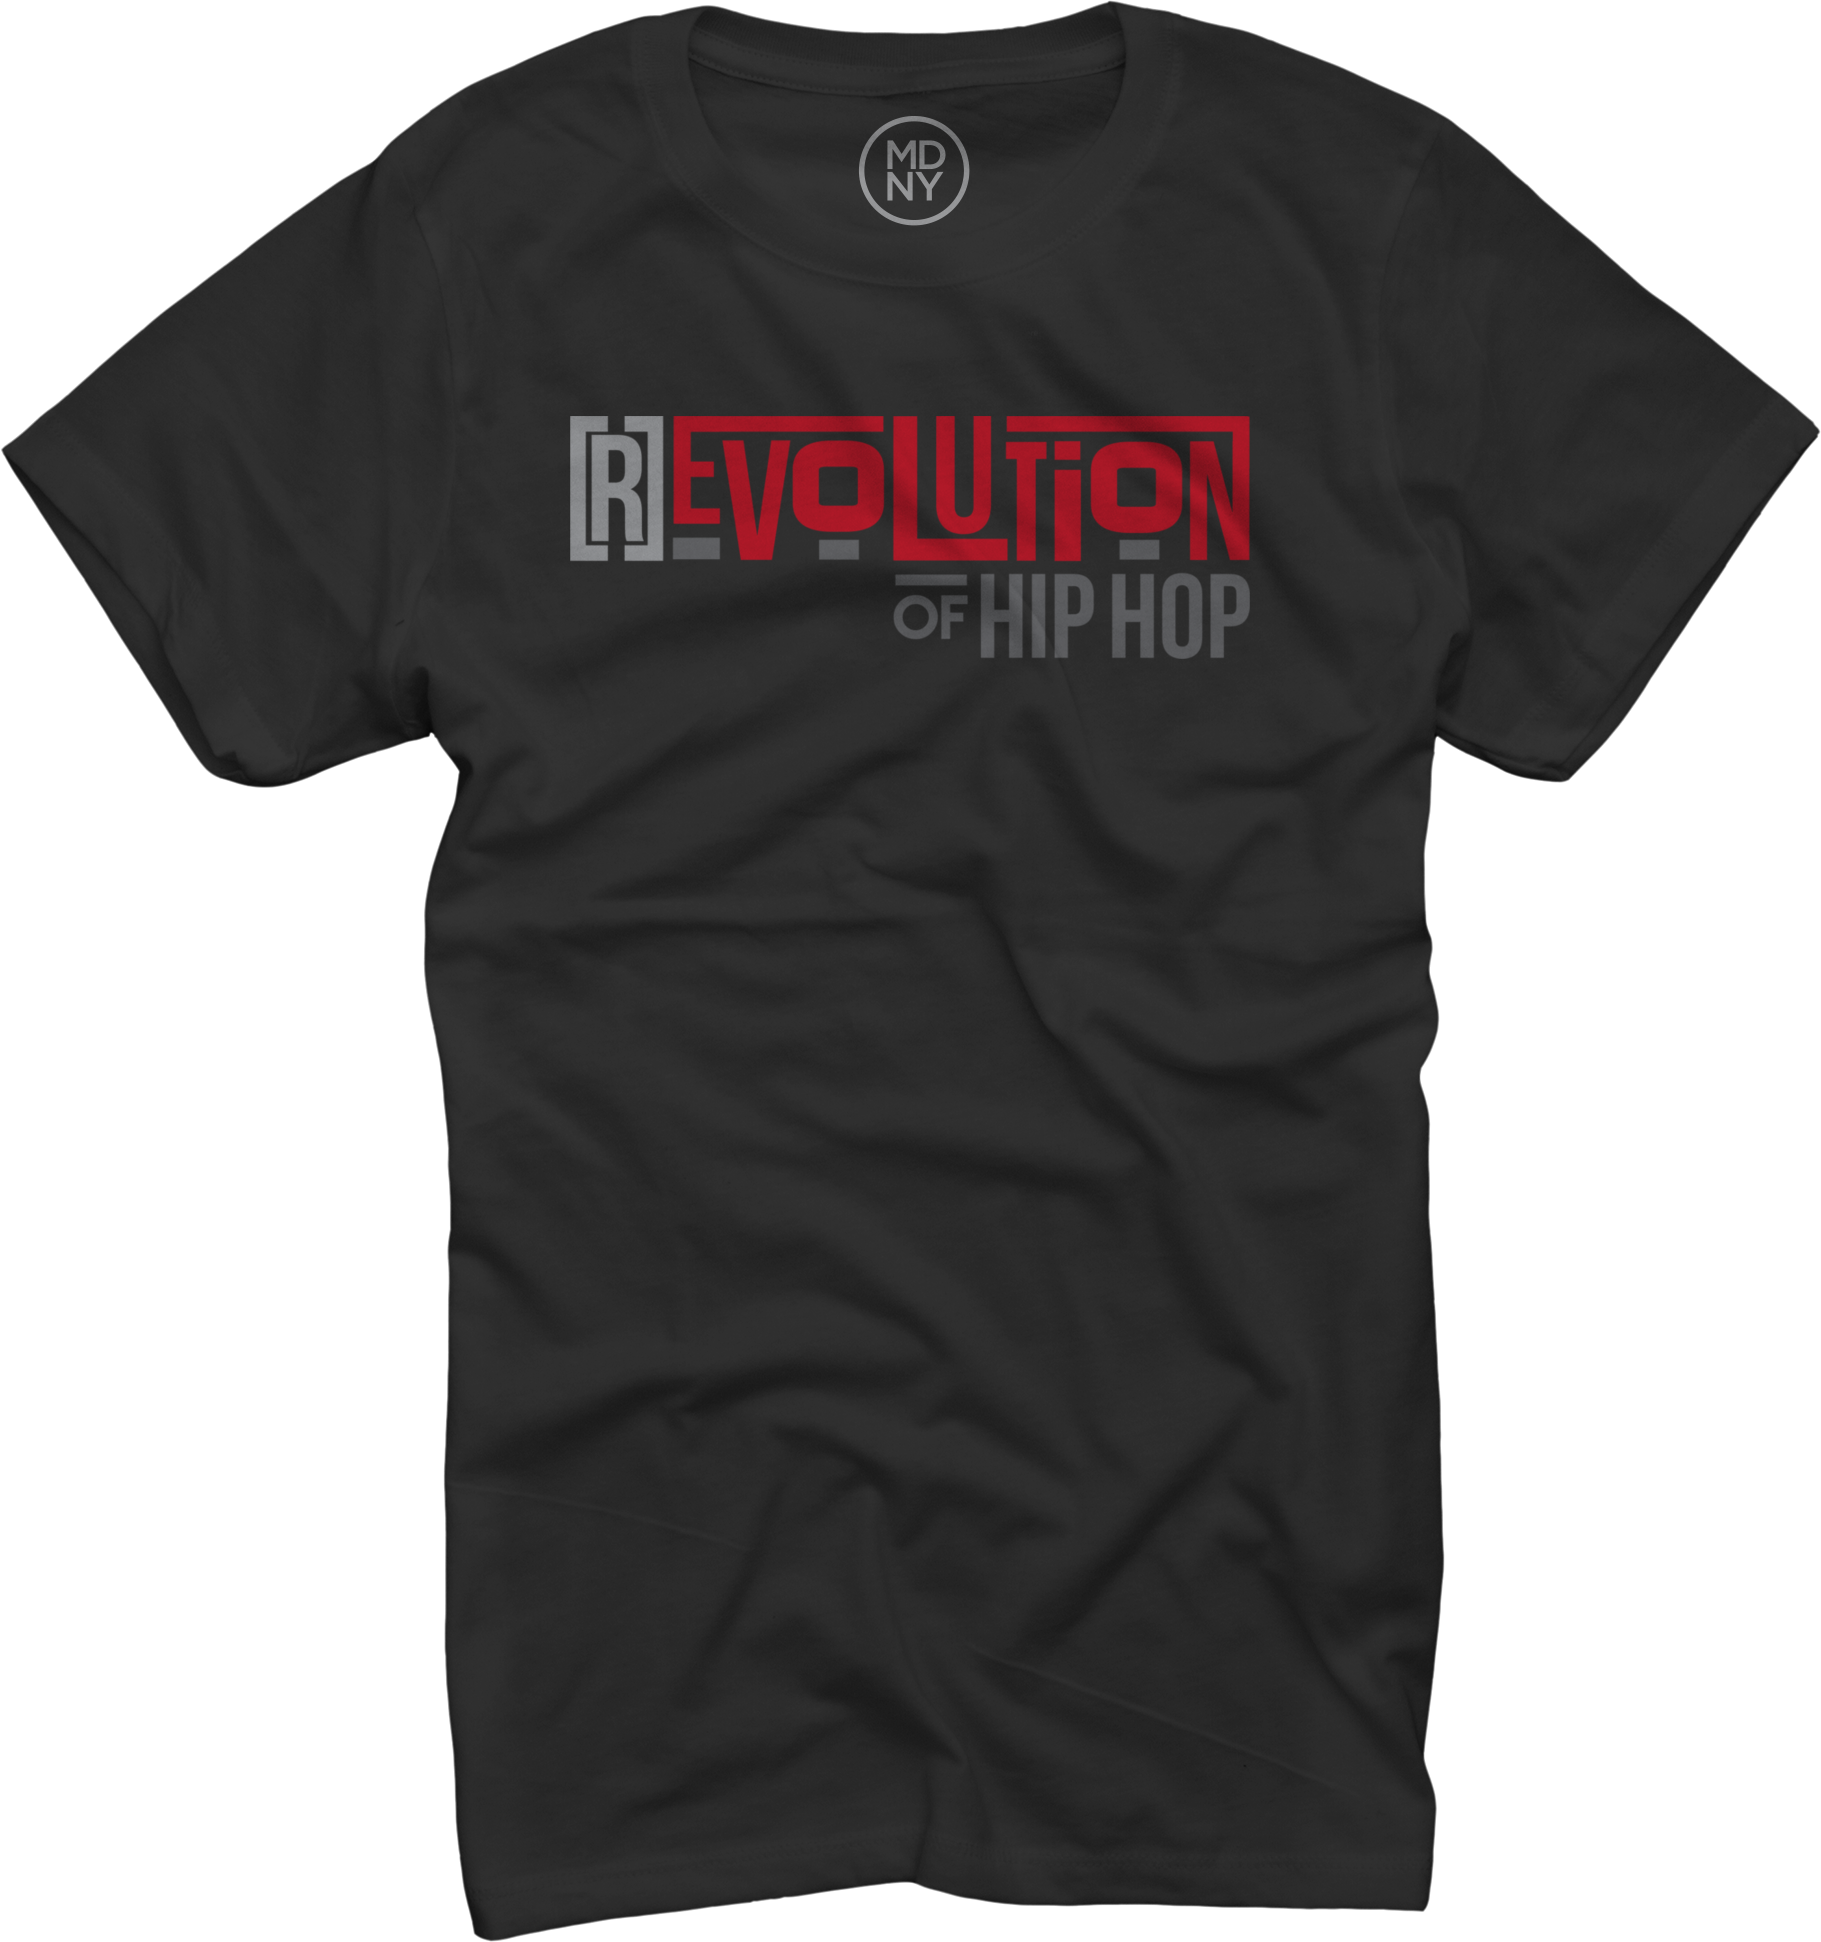 [R]Evolution of Hip Hop Women's